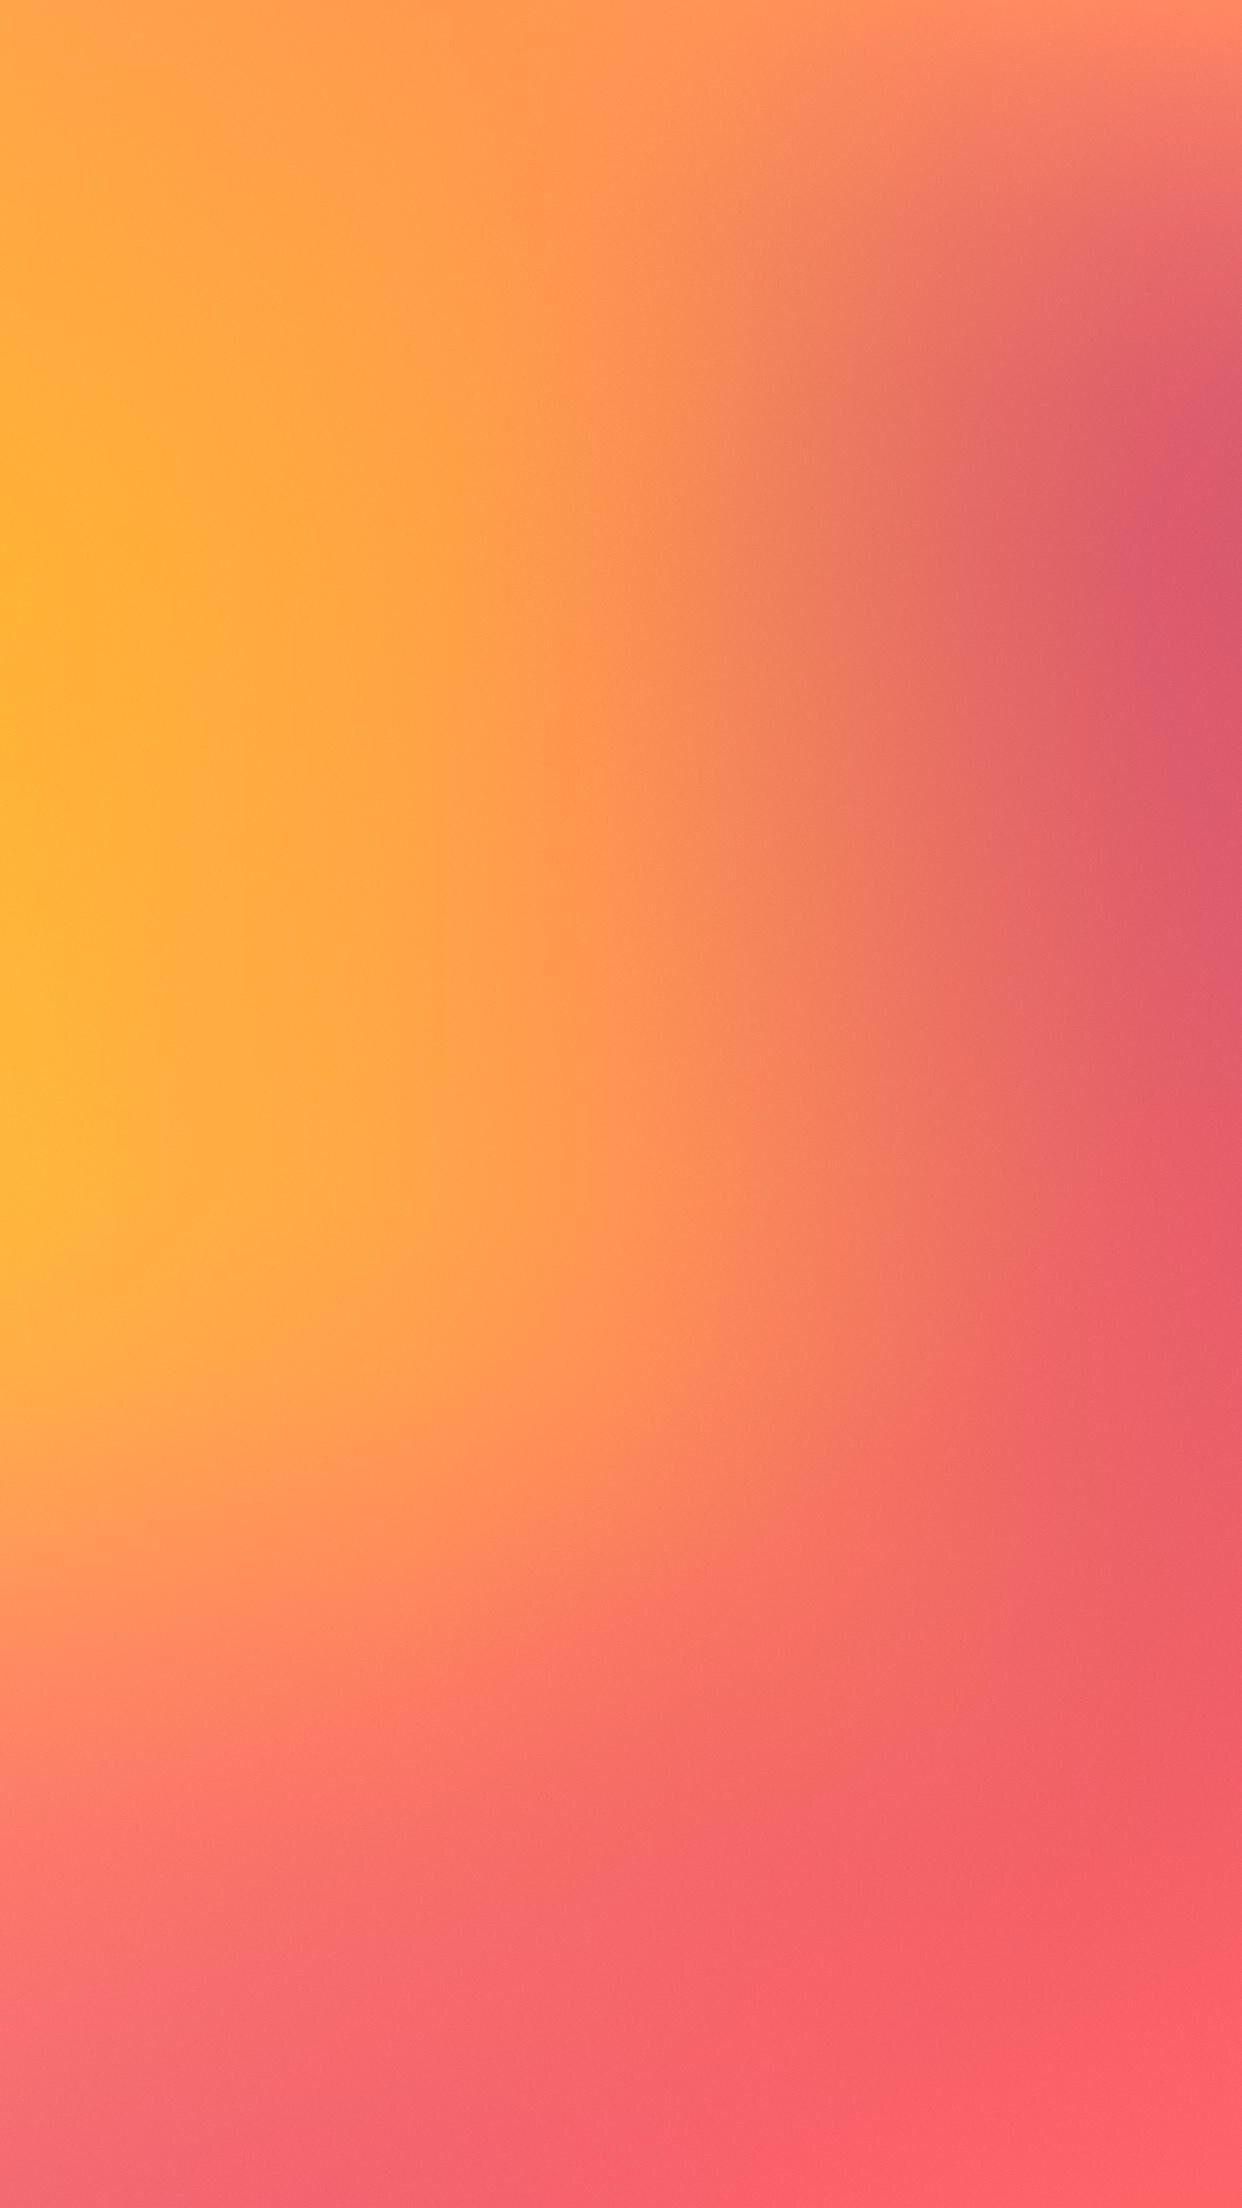 Orange Background Fond D Ecran Orange Fond D Ecran Telephone Fond D Ecran Couleur